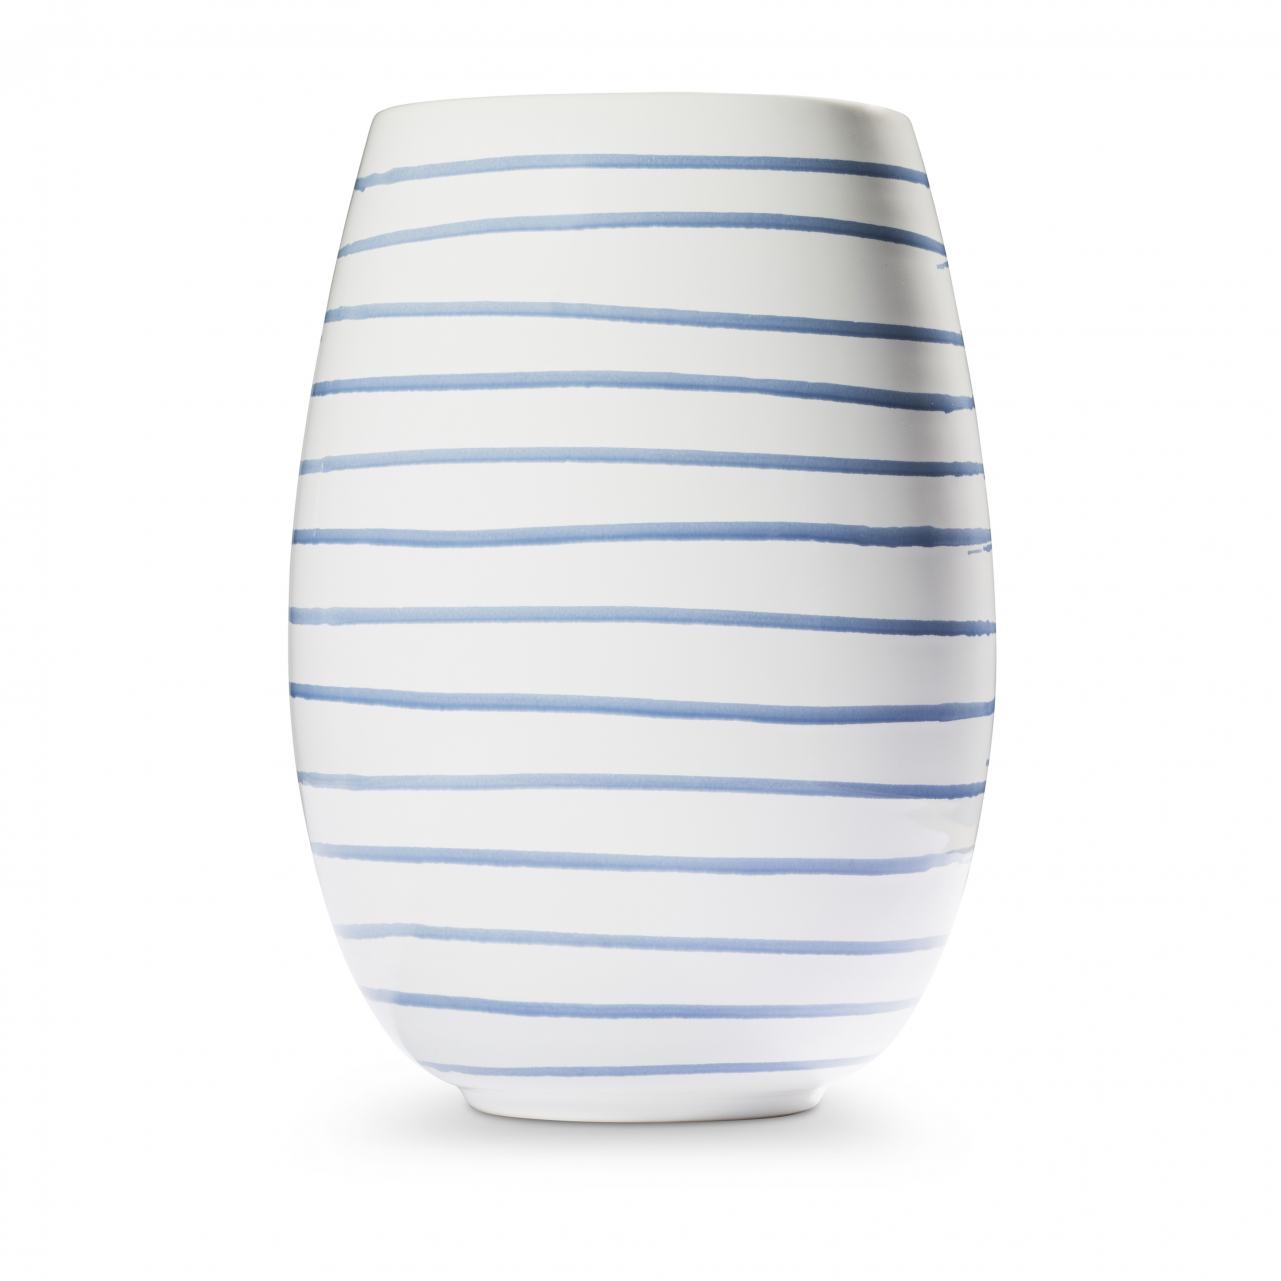 Gmundner Keramik Blaugeflammt Vase H: 21cm